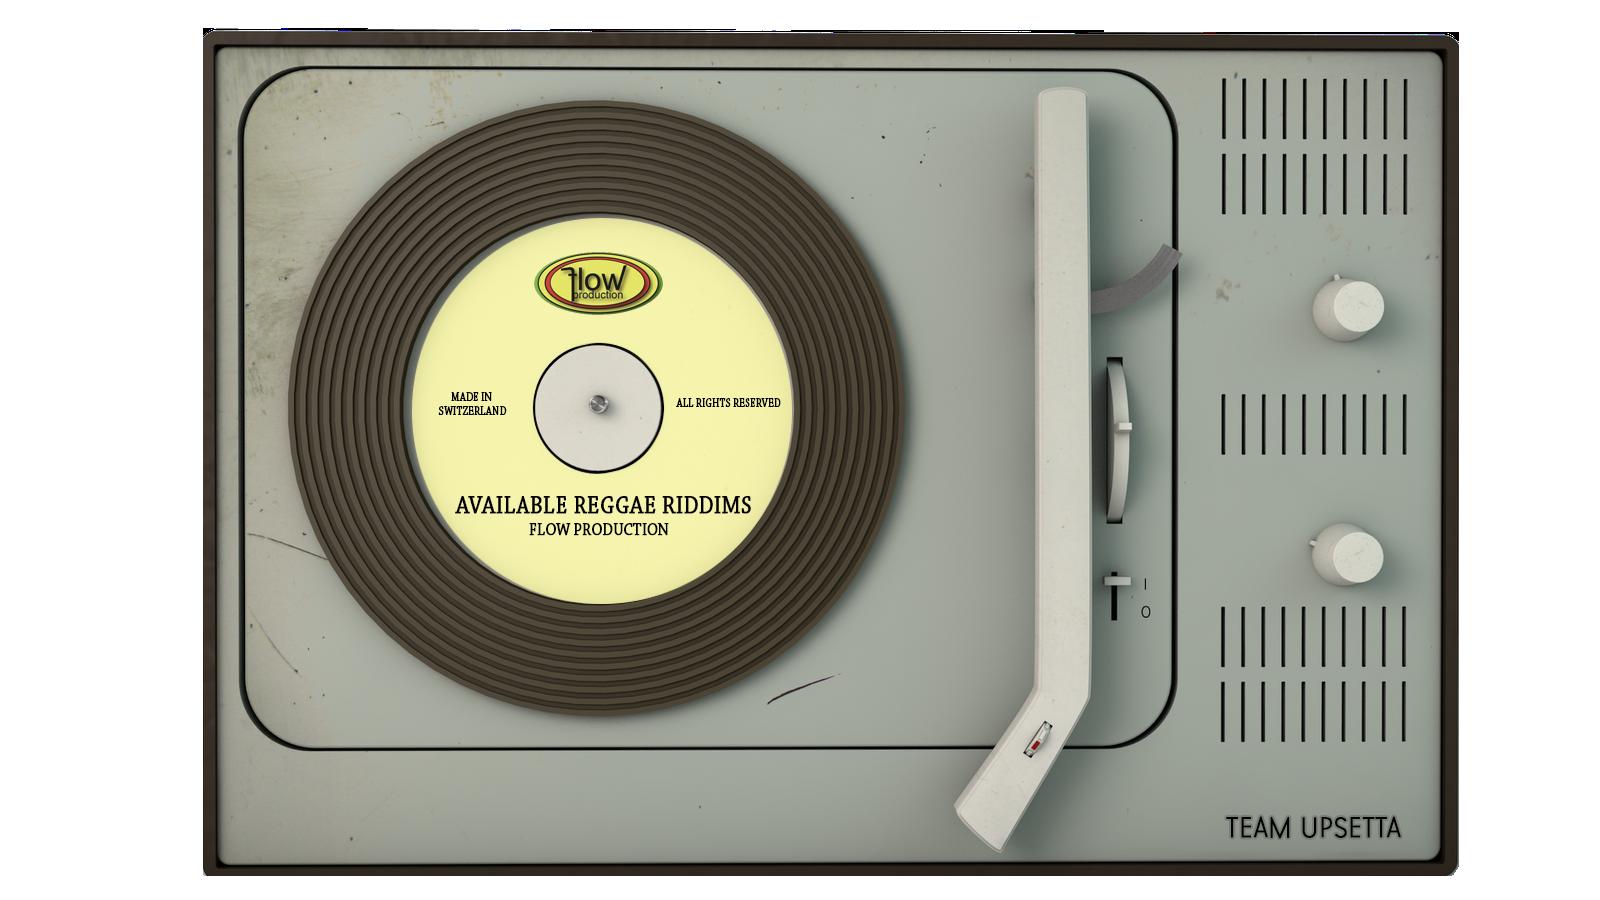 Flow-Production-Reggae-Riddims-For-Sale